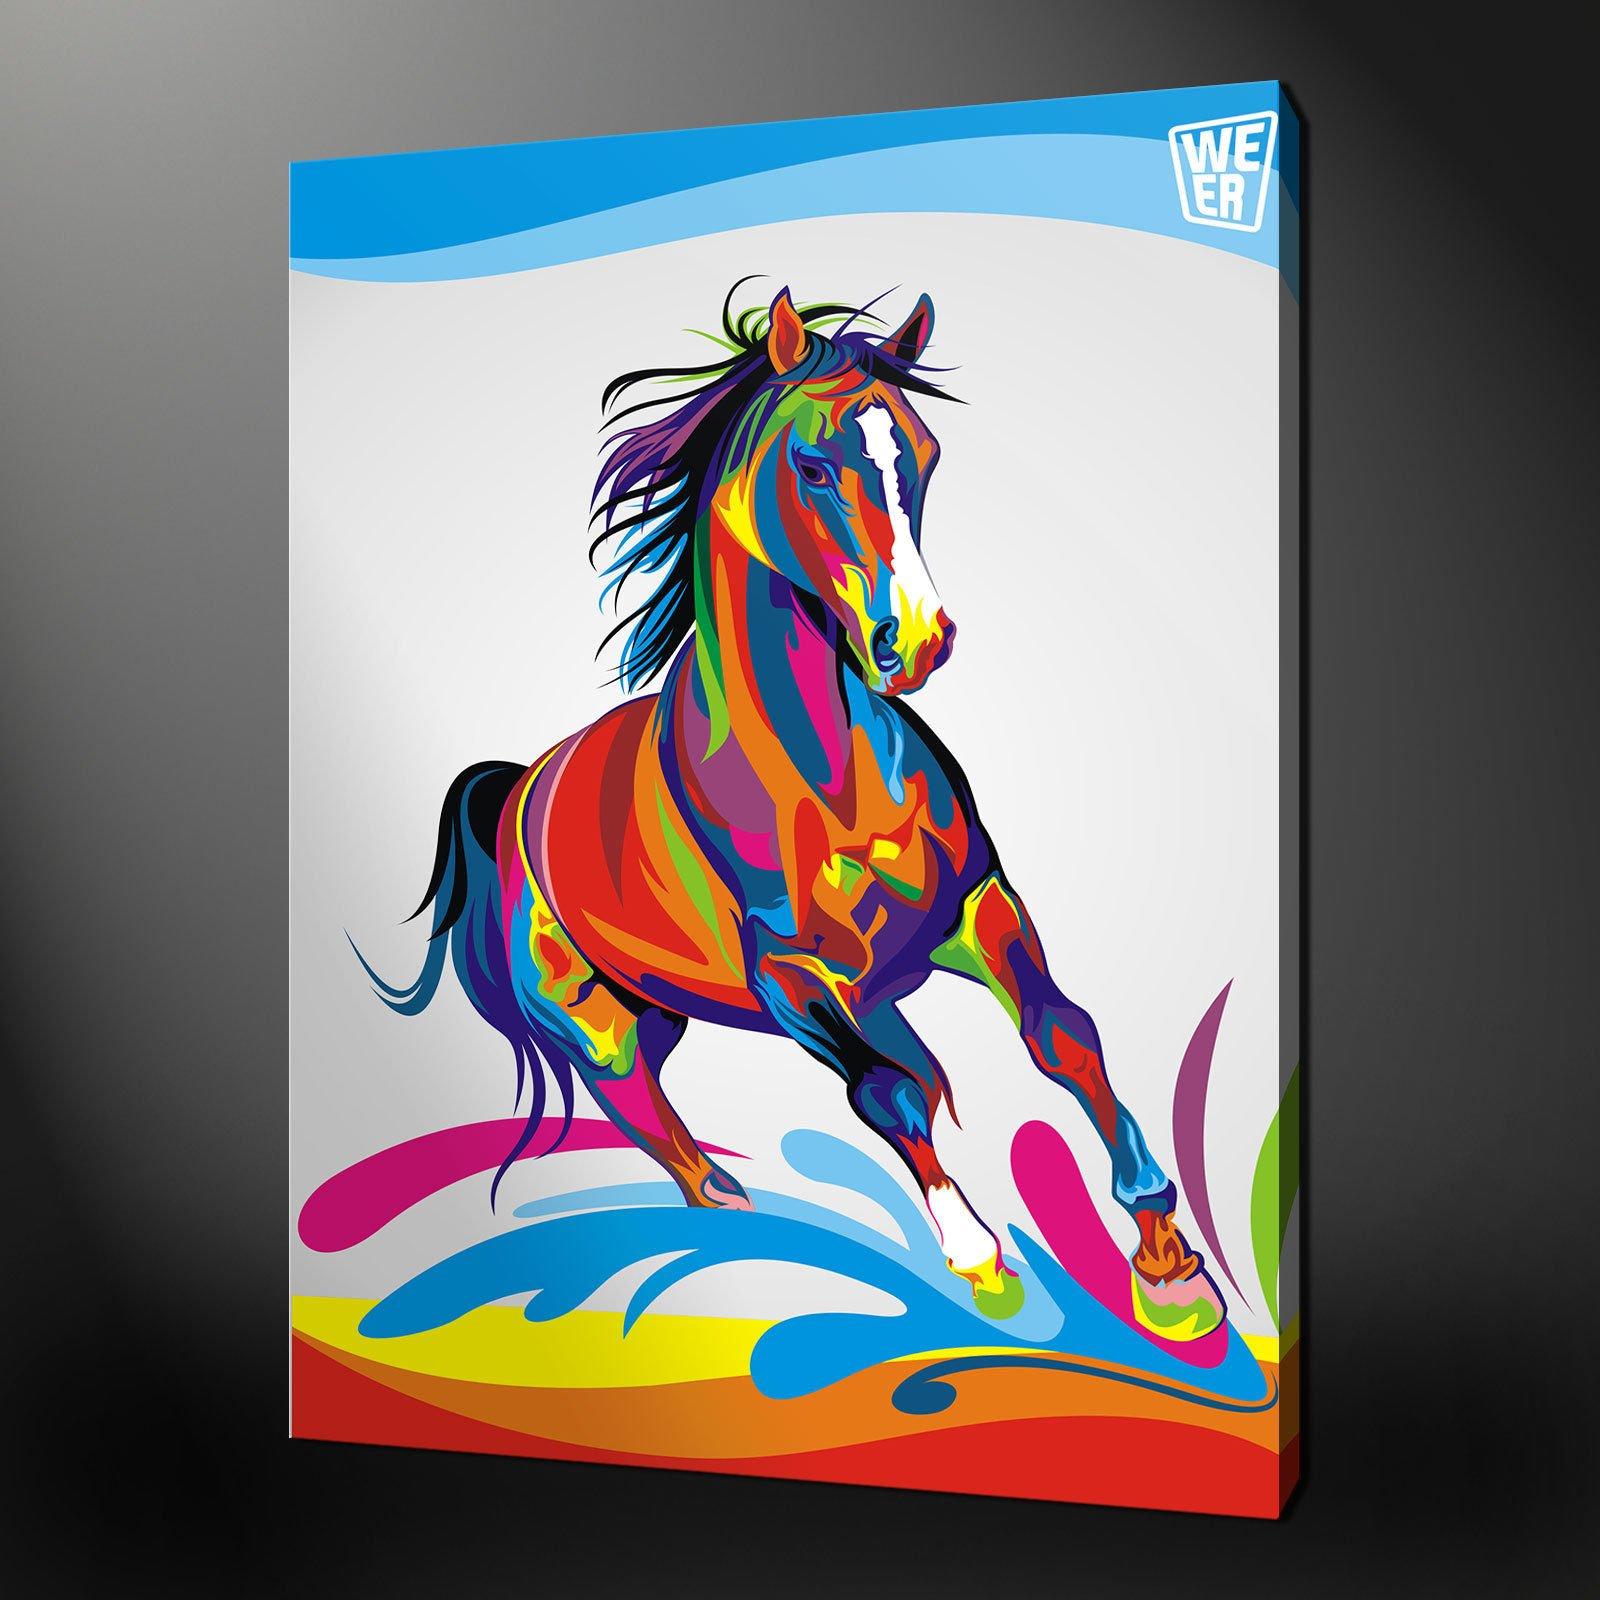 Art Design On Line : Abstract horse art pixshark images galleries